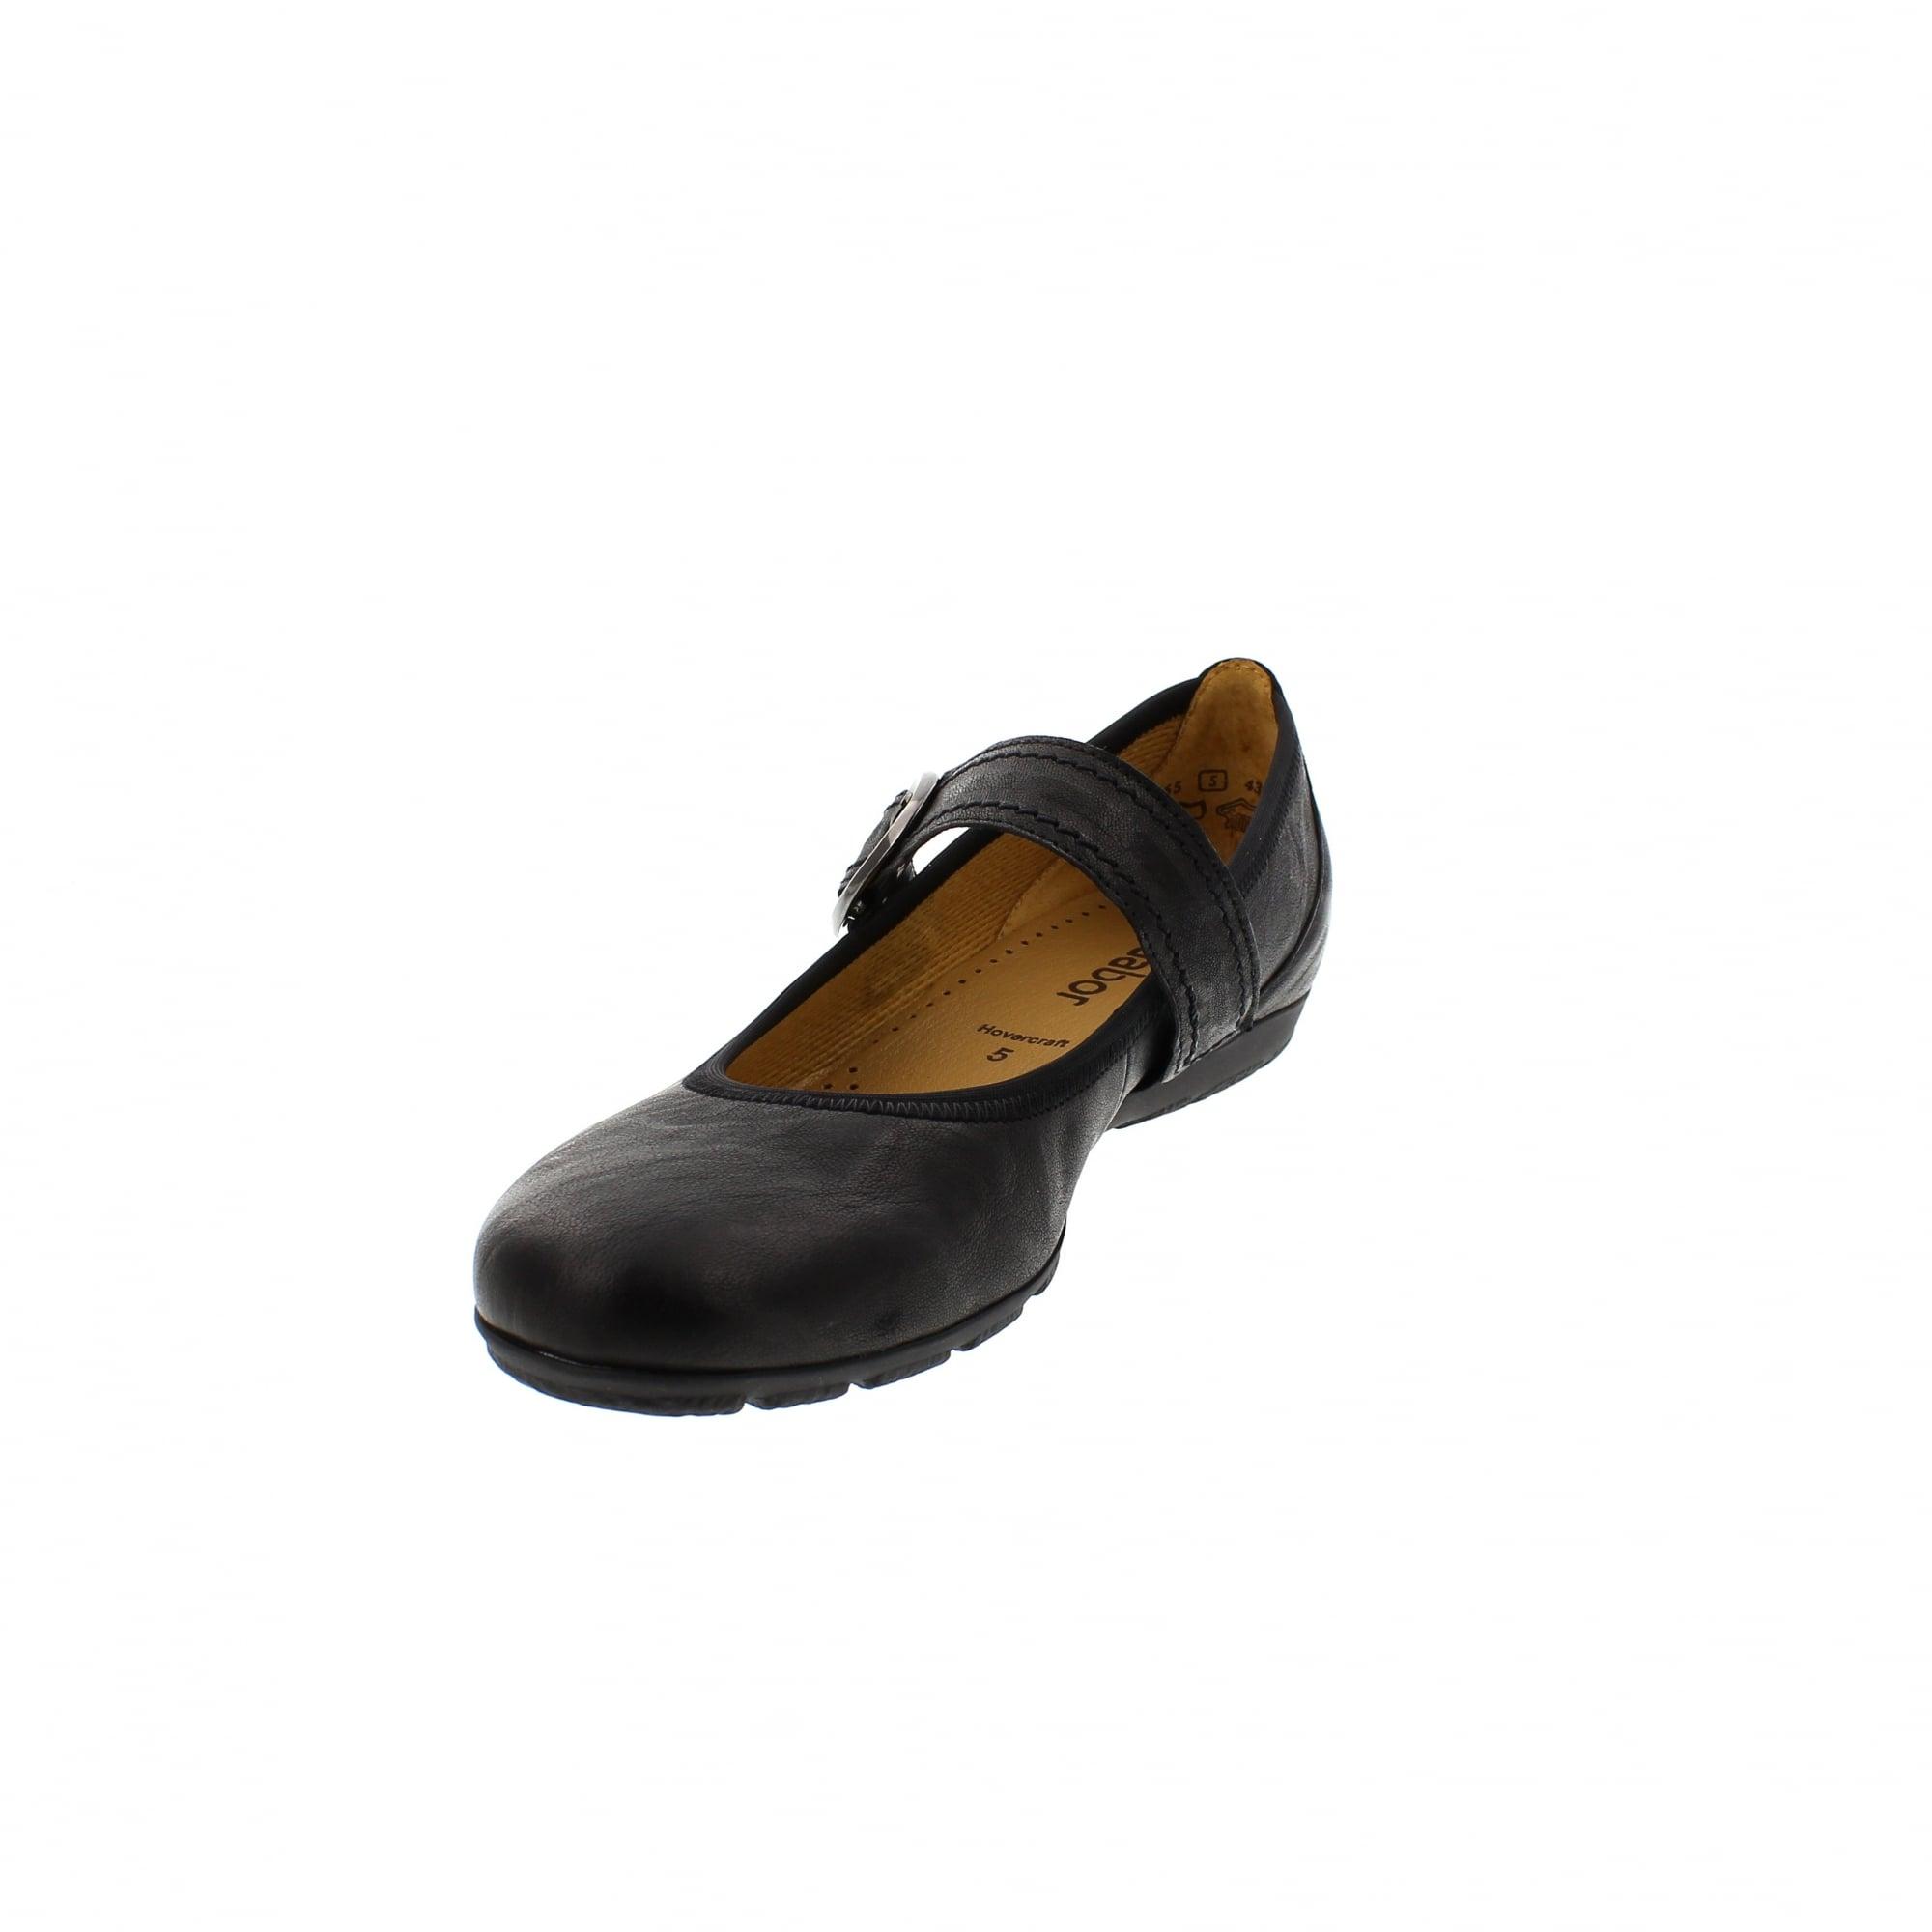 6b6ff31a0075b Gabor Hutton 84-165-57 Black Leather Mary Jane Bar Shoes | Rogerson ...